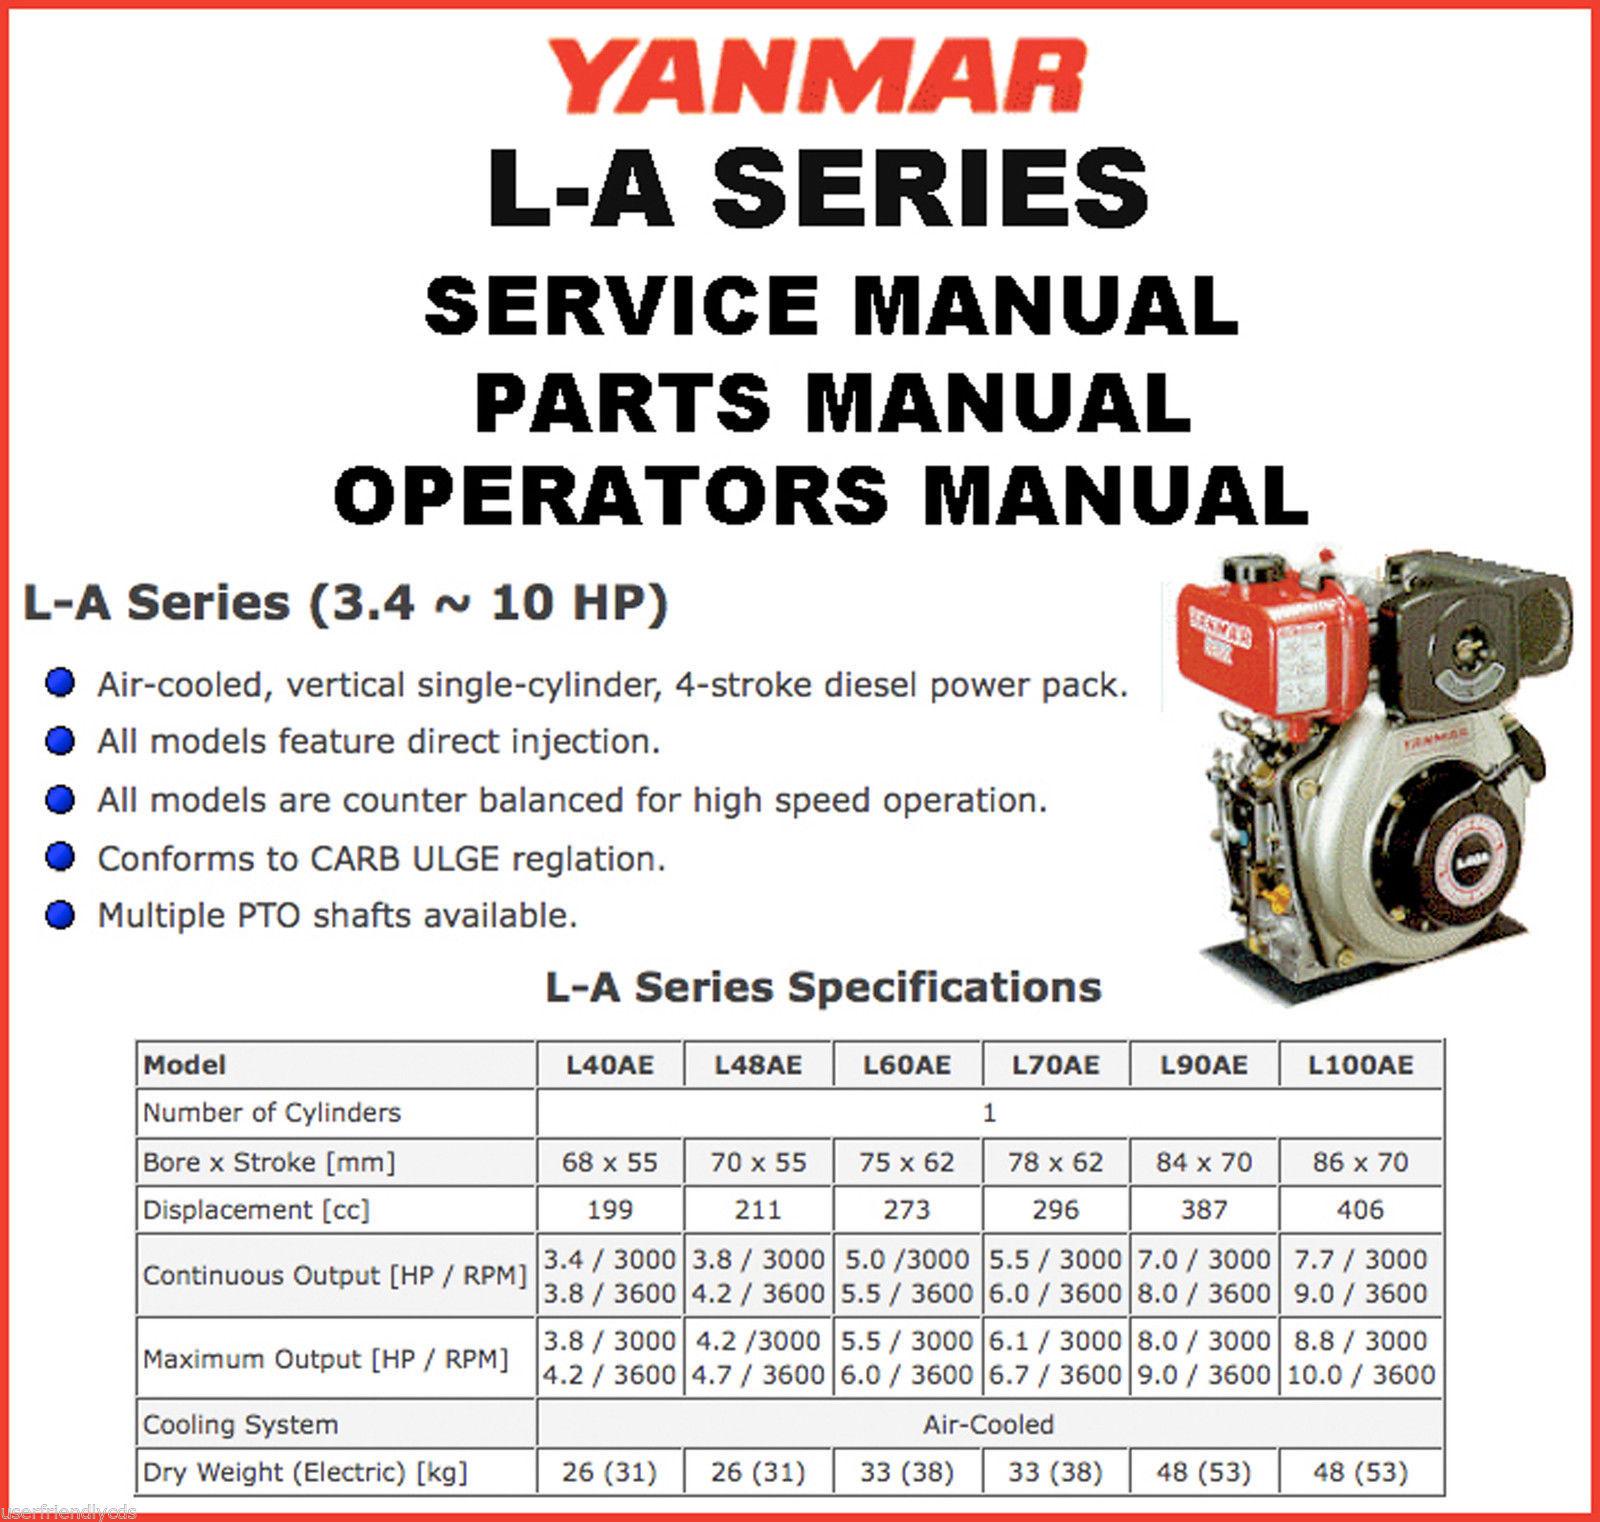 YANMAR L-A Engine SERVICE MANUAL & Parts Catalogs & Operator -4- MANUALS CD